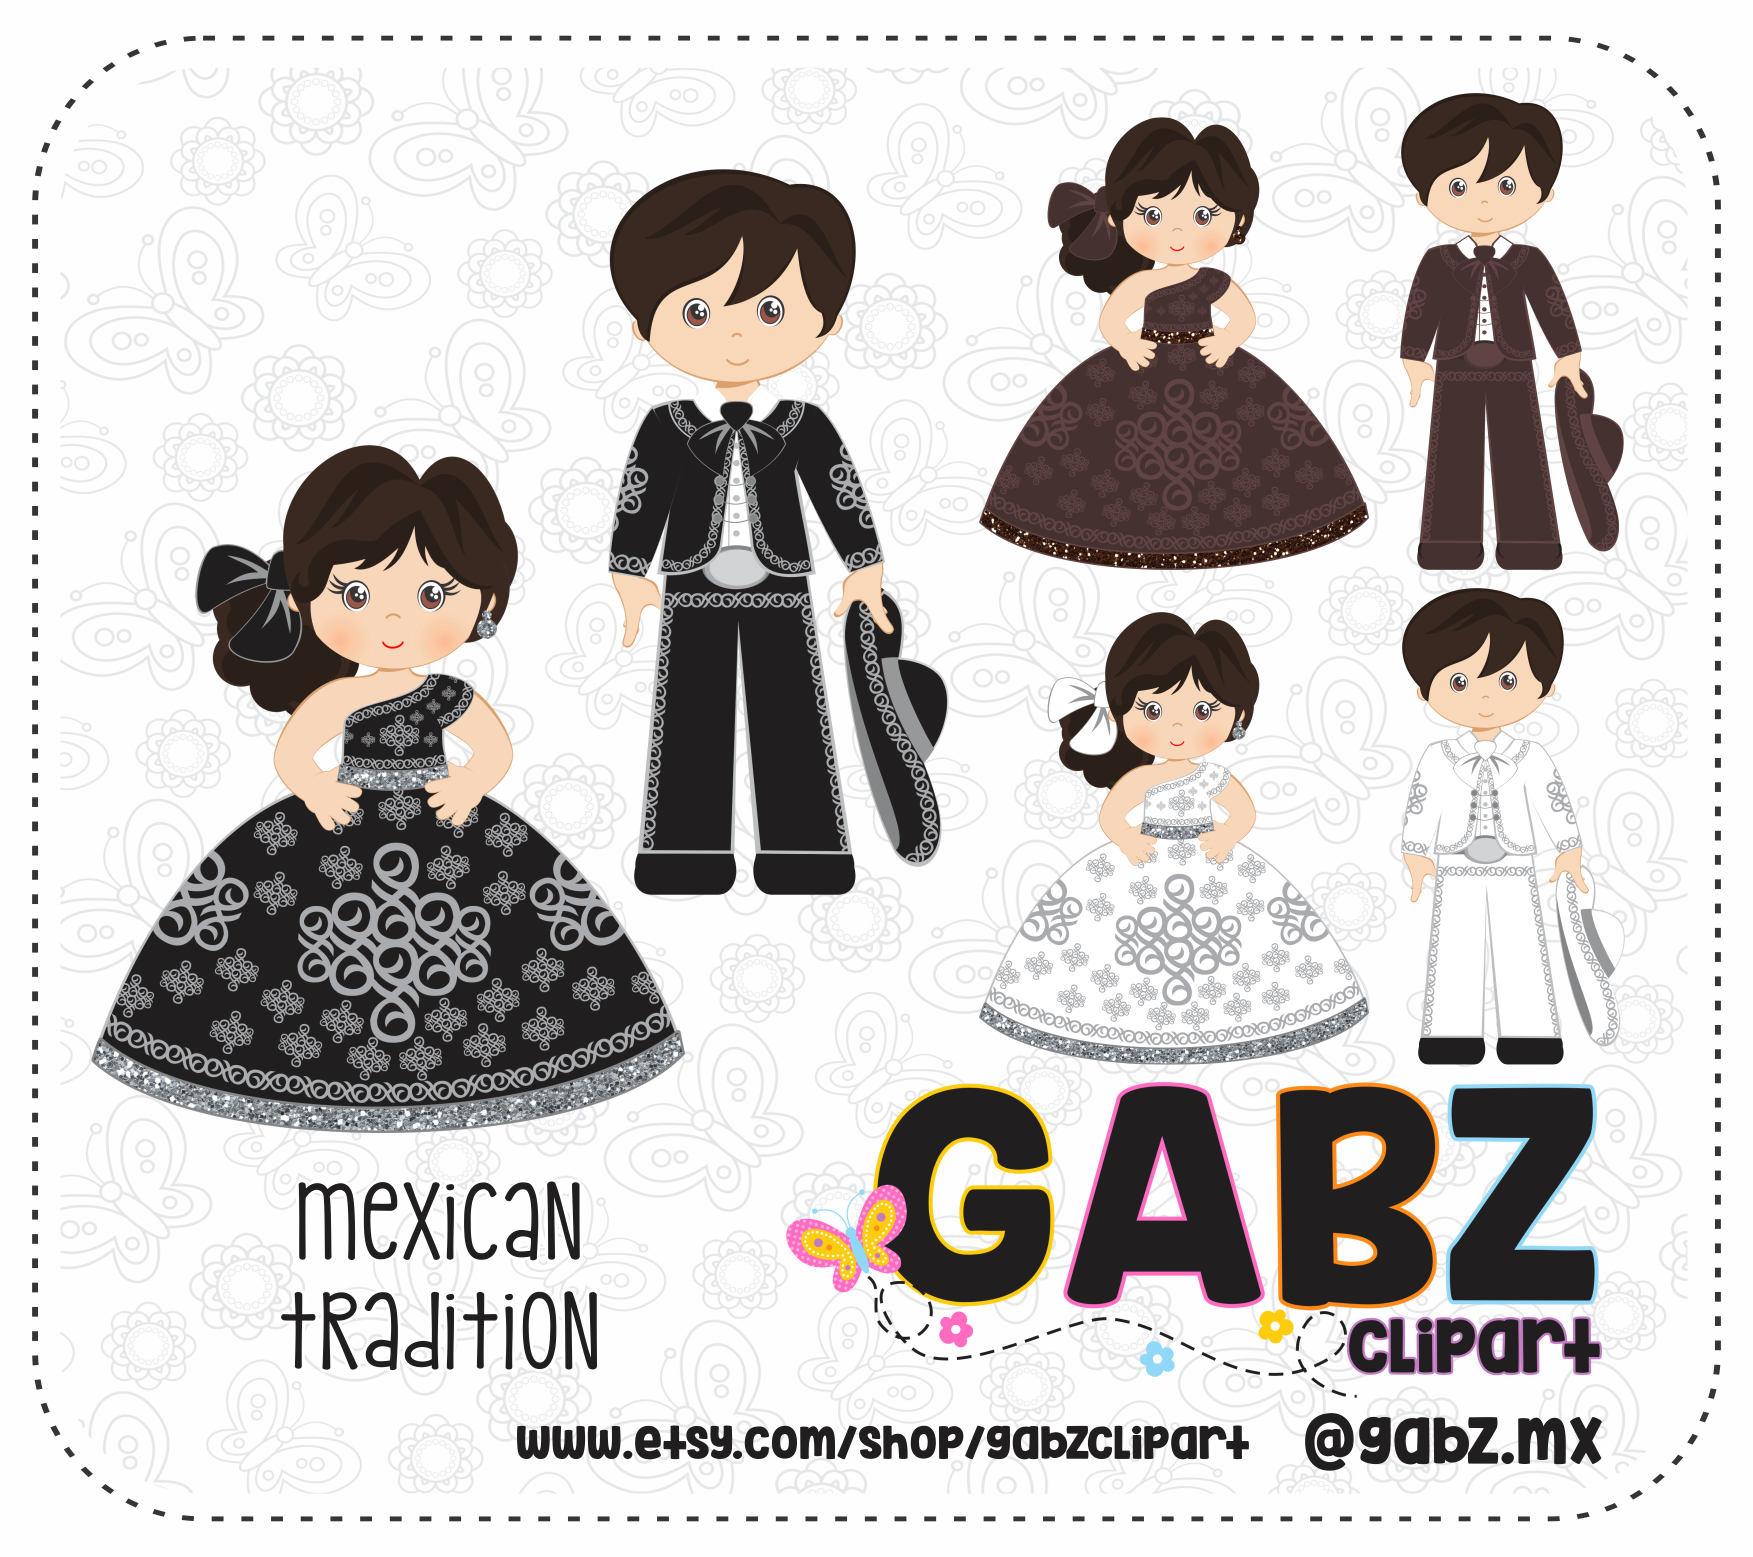 Tequila clipart mexican guitar Aztec Patterns file Confetti digital